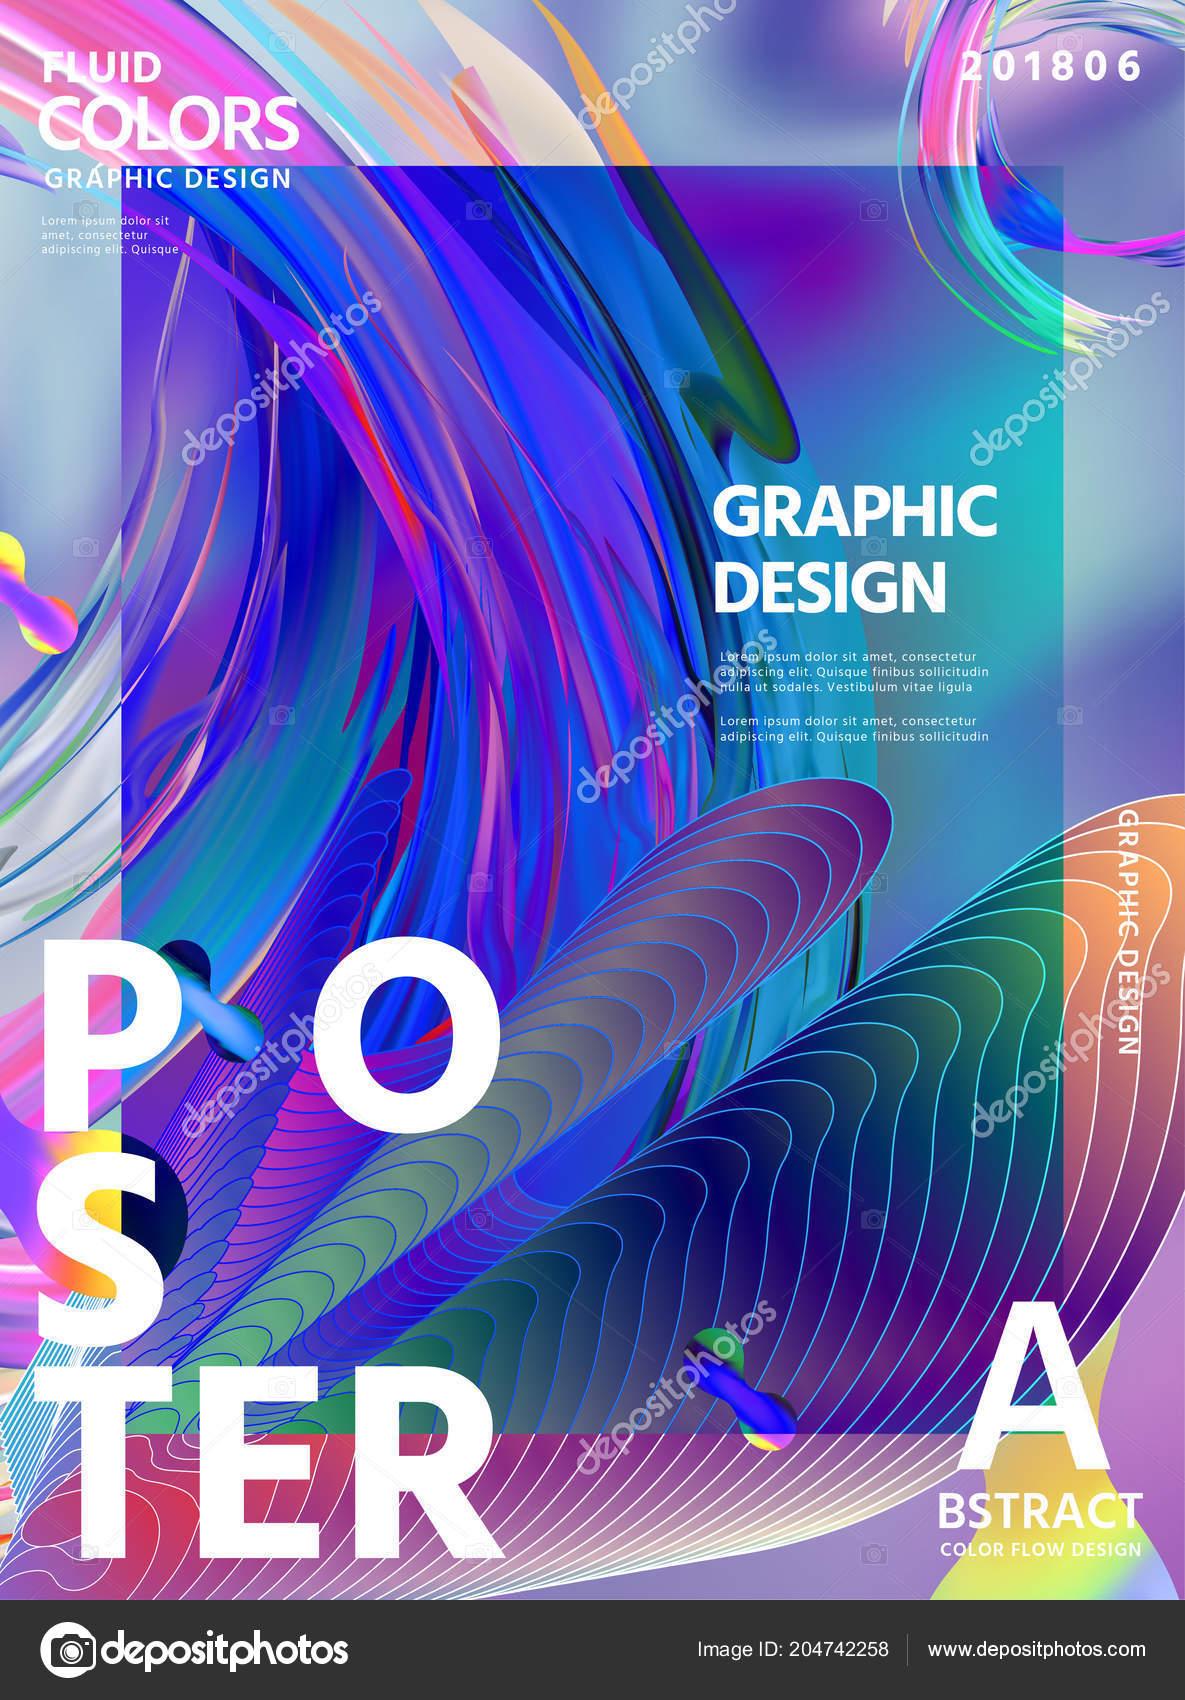 Abstract Fluid Colors Poster Design Wavy Liquid Shape